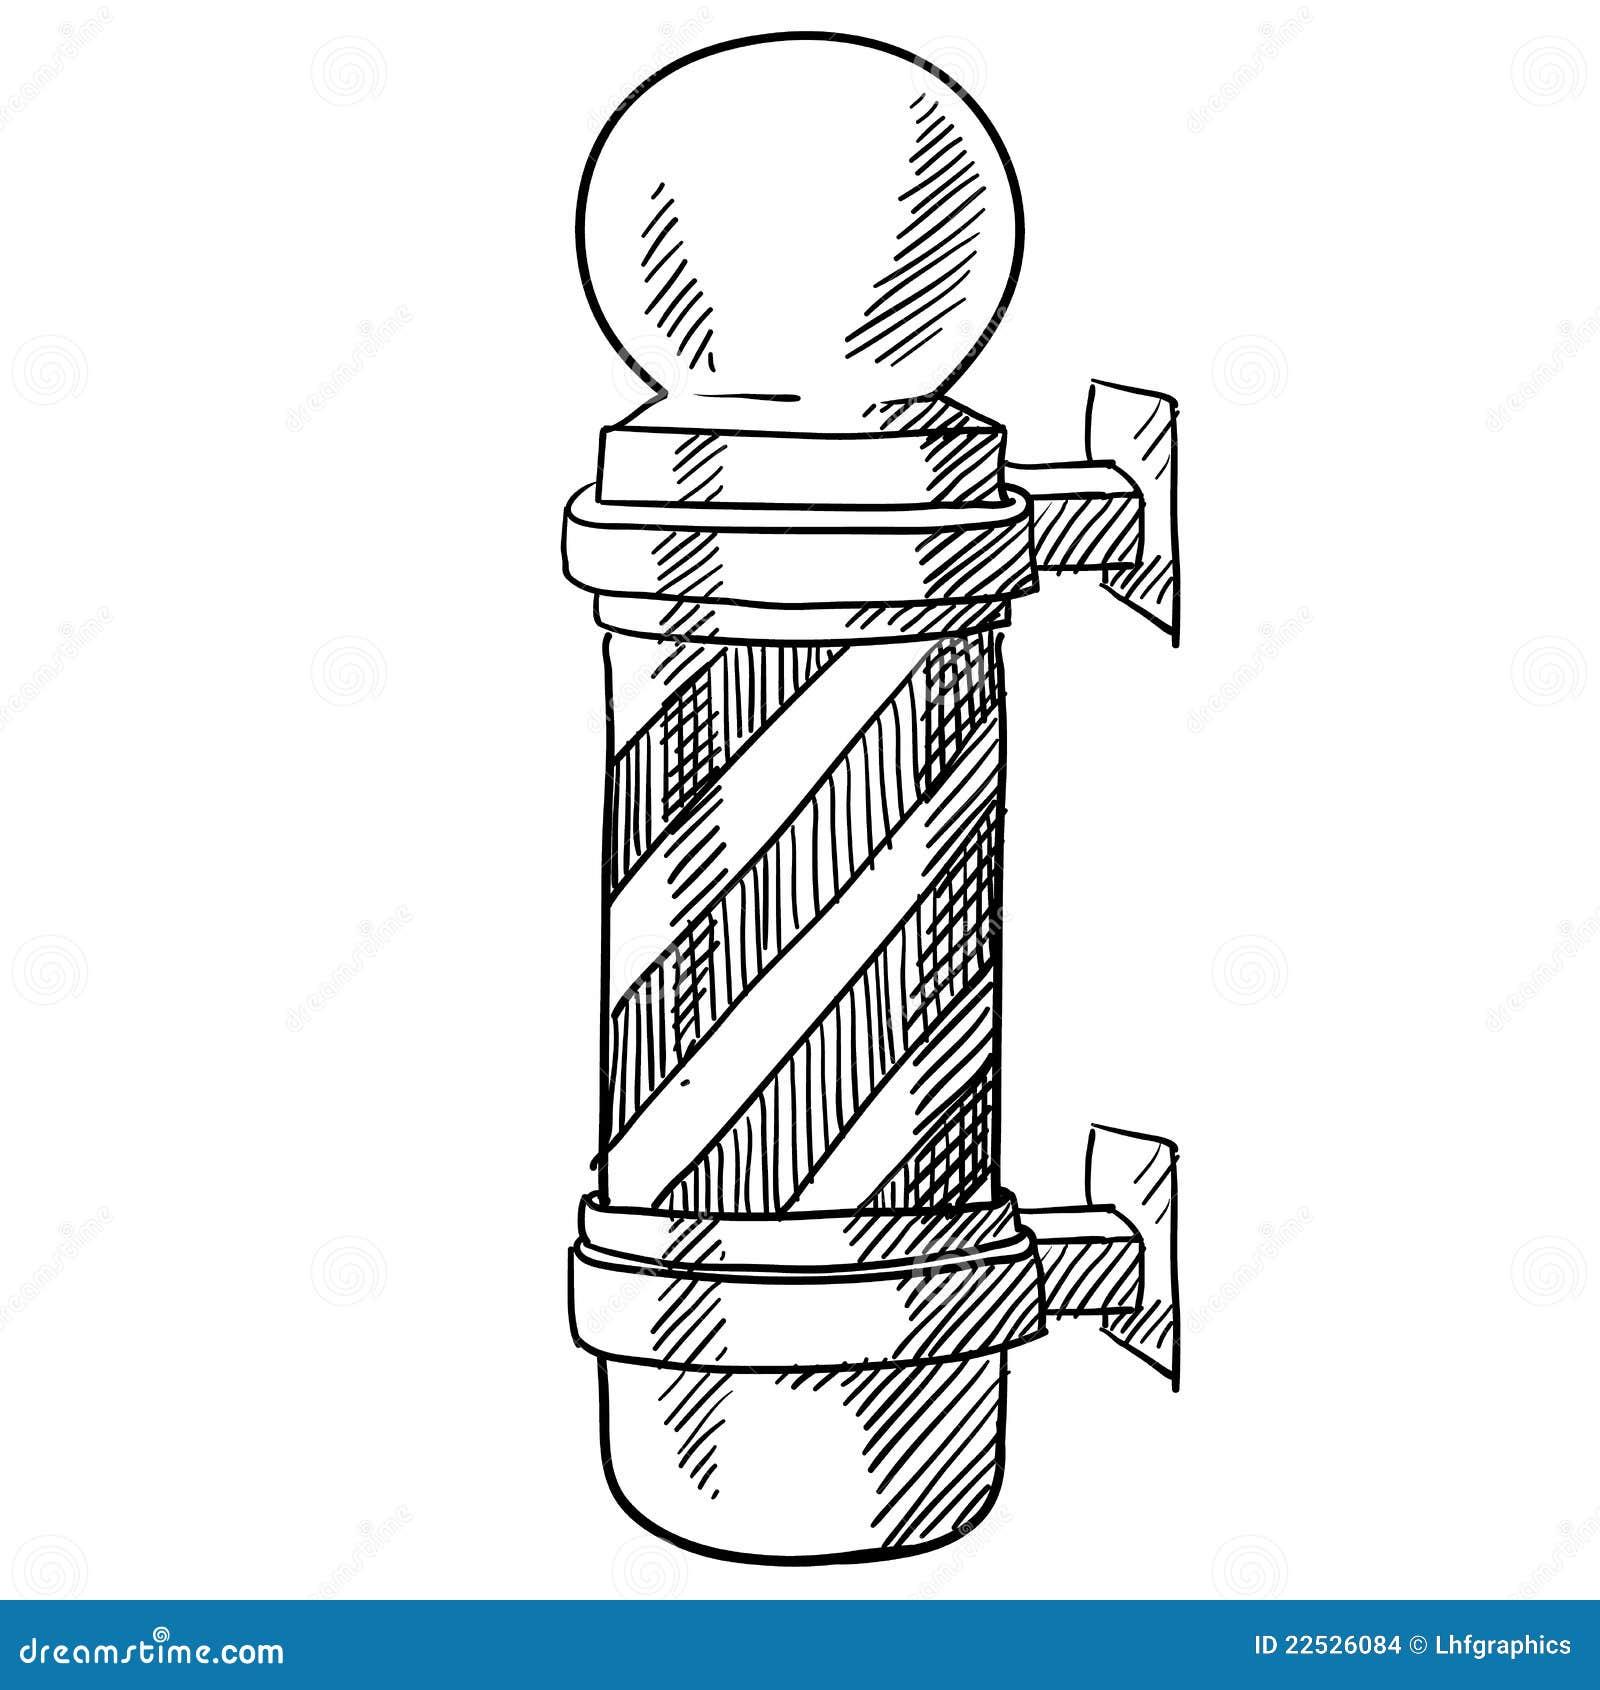 Doodle style striped barbershop pole illustration in vector format